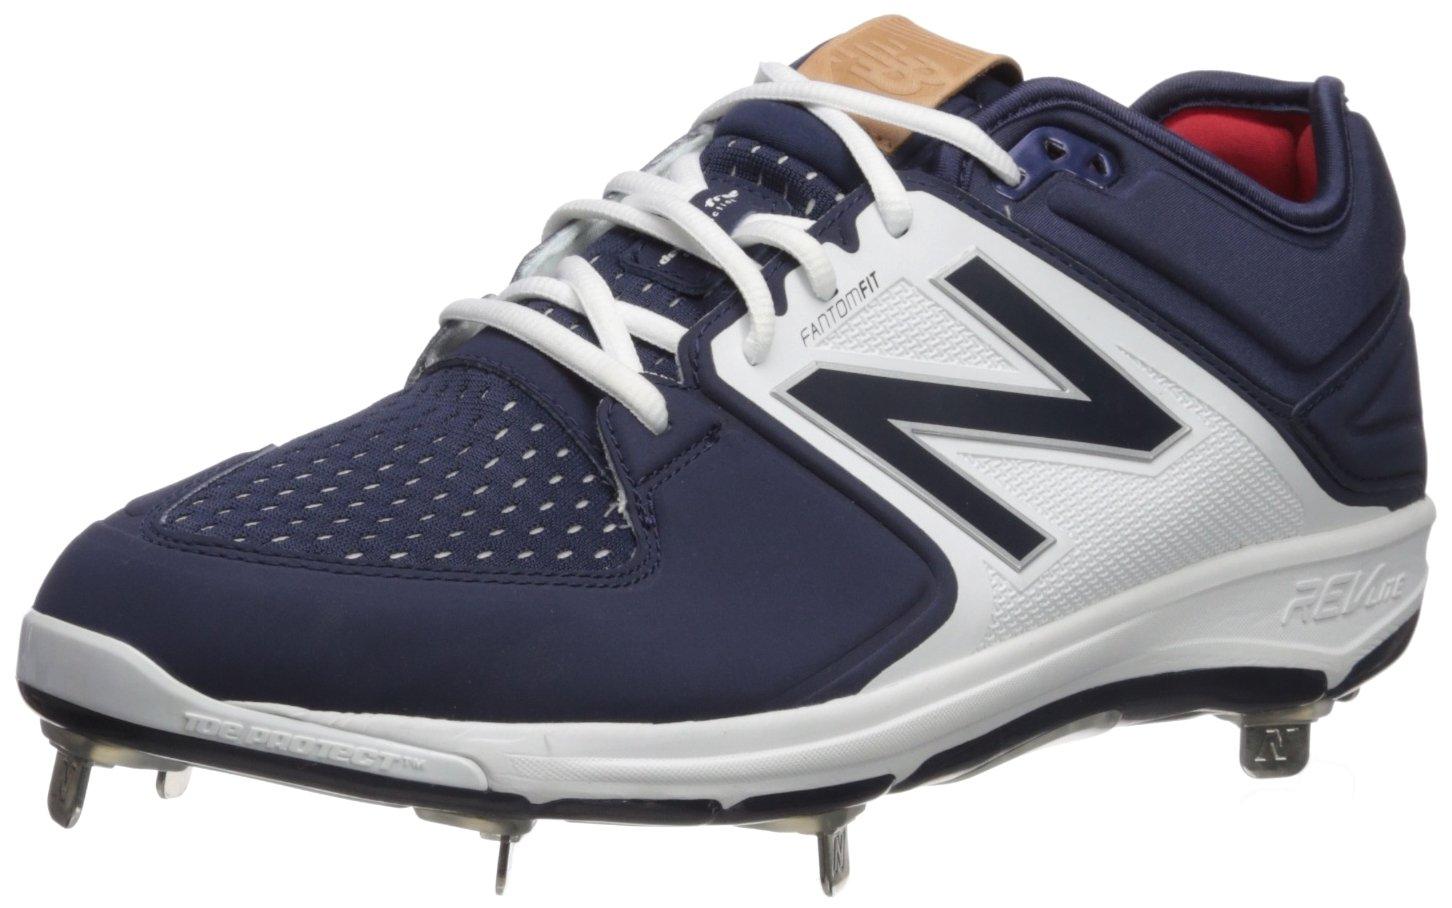 New Balance Men's L3000v3 Metal Baseball Shoe B019EEOFXK 9.5 D(M) US|Navy/White